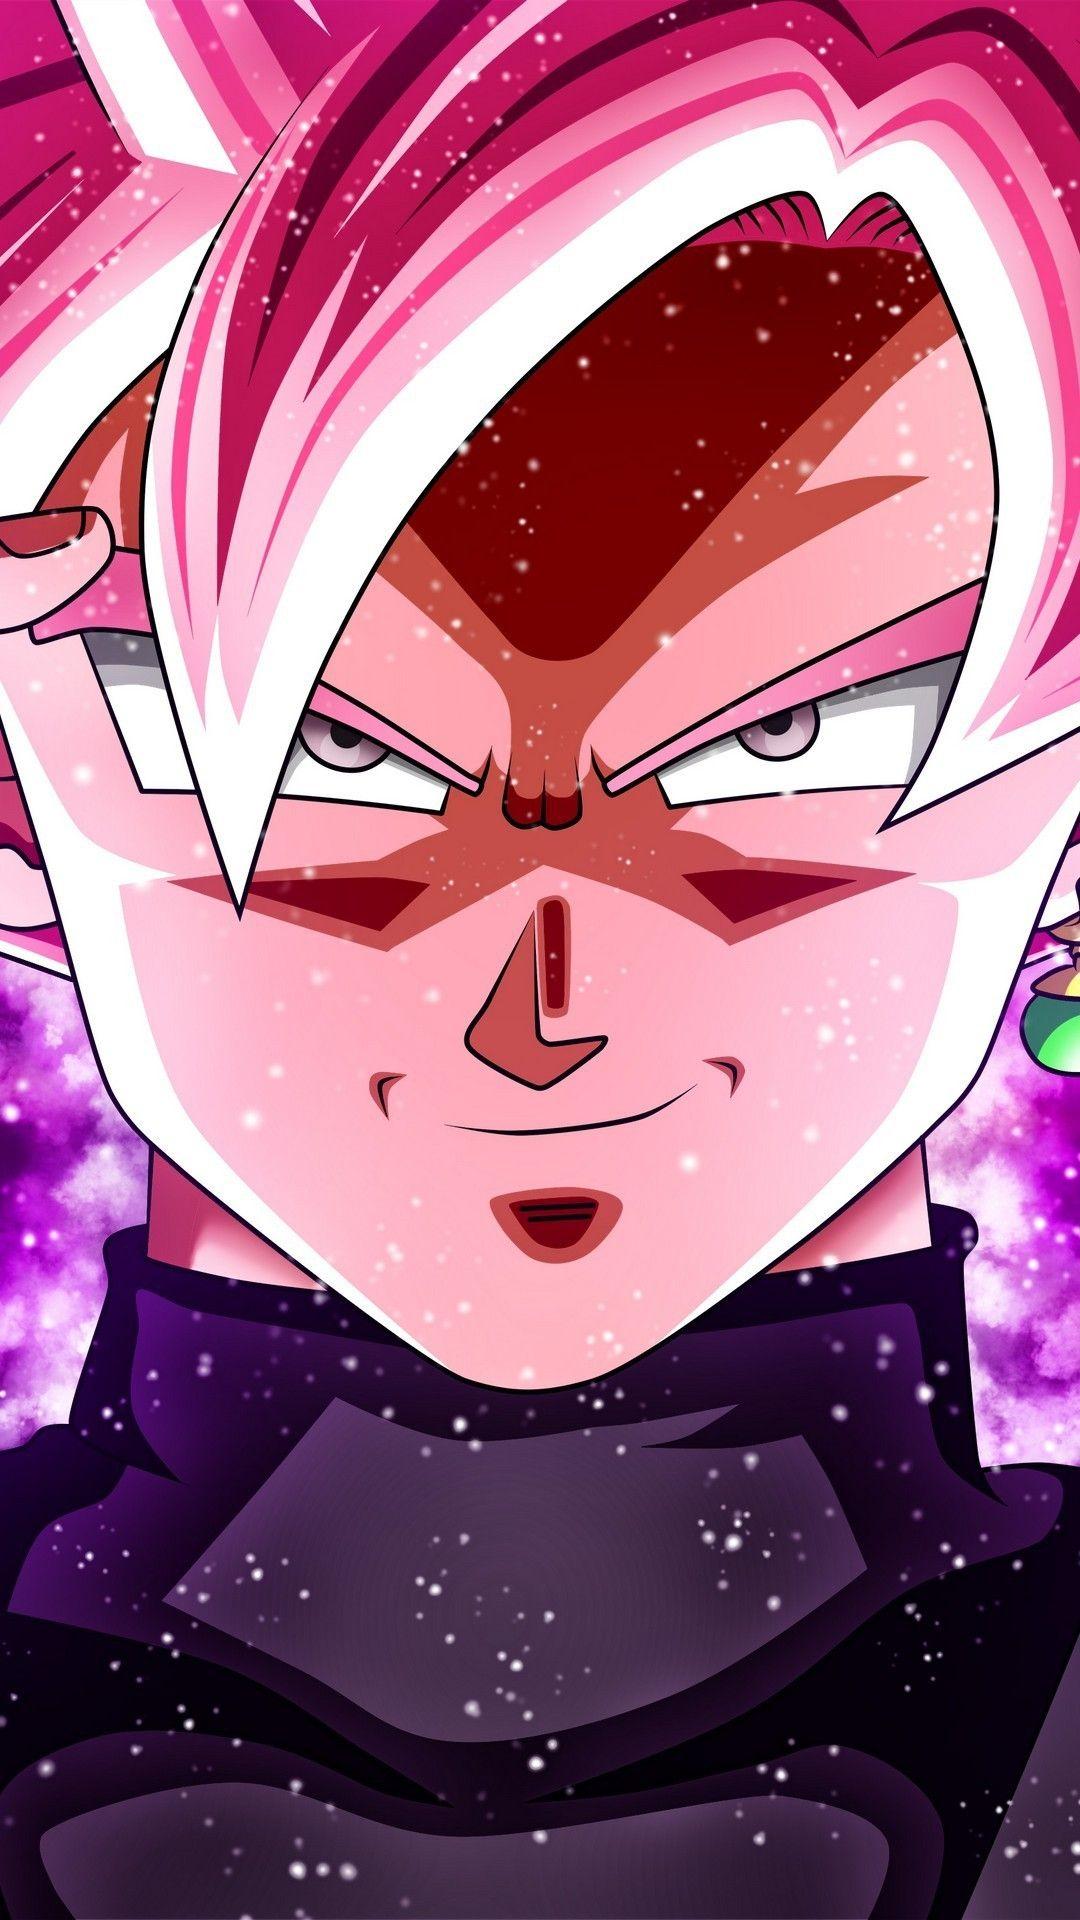 Black Goku Backgrounds For Android Best Mobile Wallpaper Anime Dragon Ball Super Anime Dragon Ball Dragon Ball Art